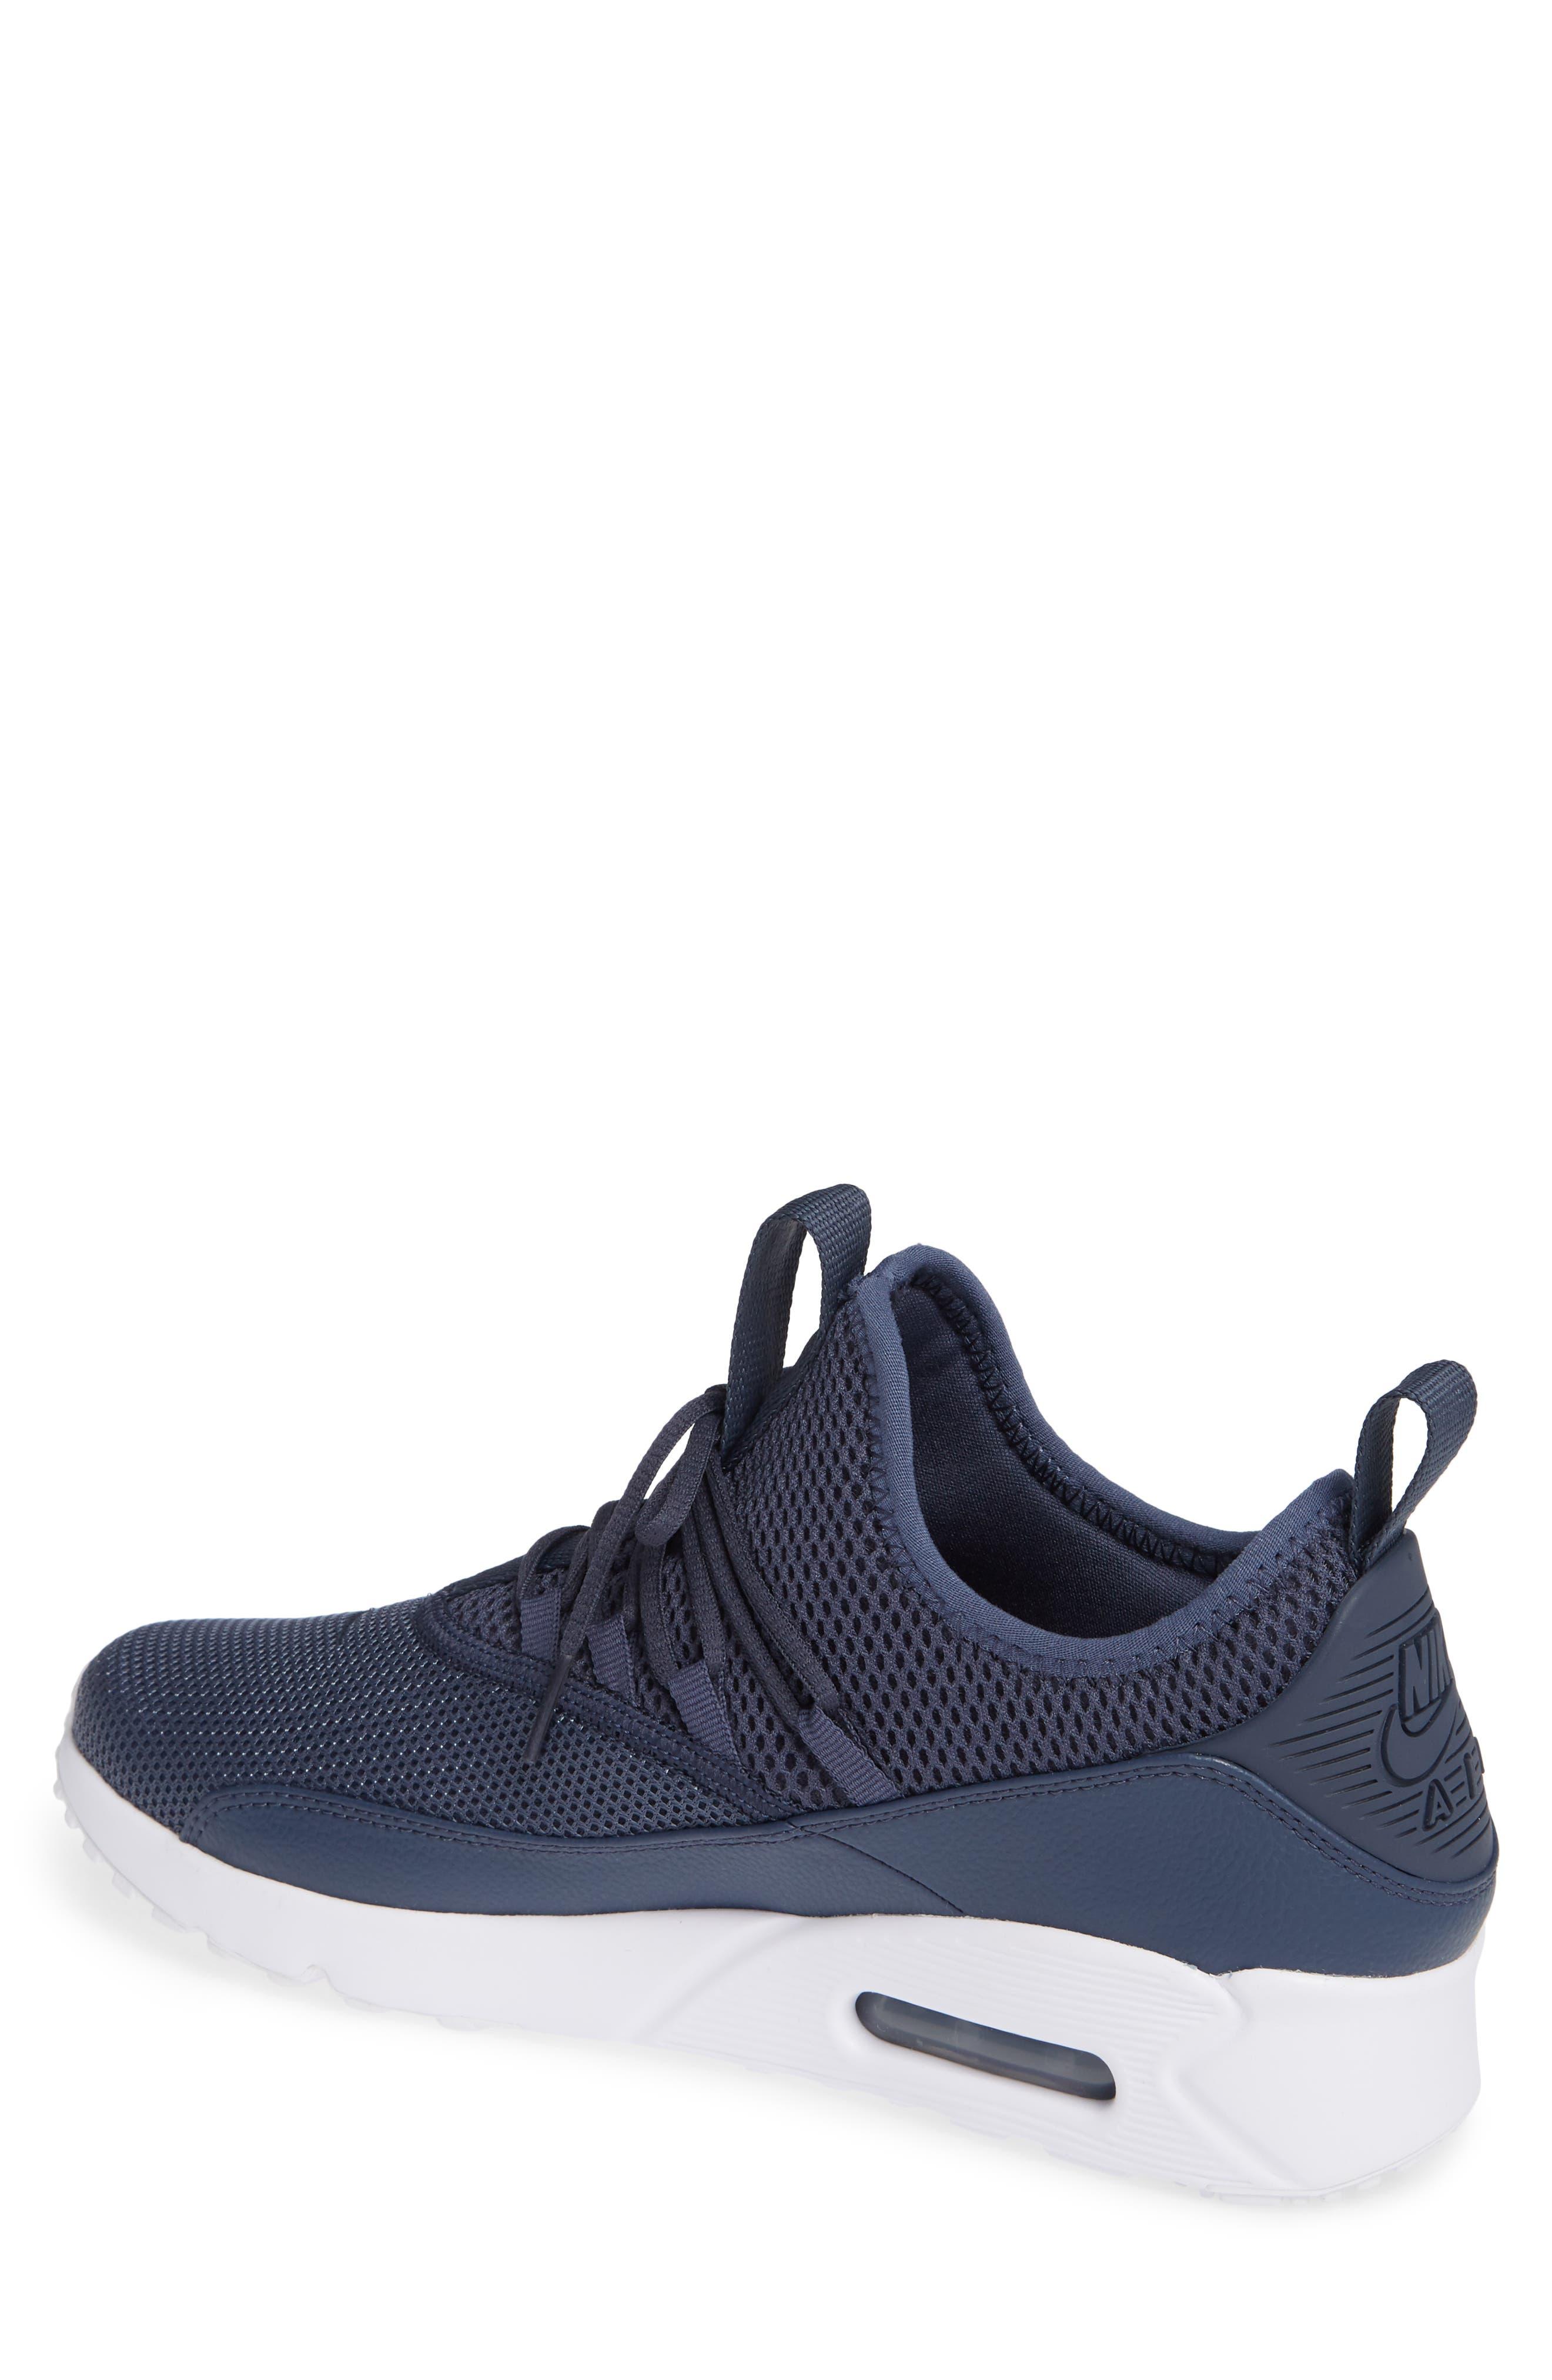 Air Max 90 EZ Sneaker,                             Alternate thumbnail 2, color,                             THUNDER BLUE/ WHITE